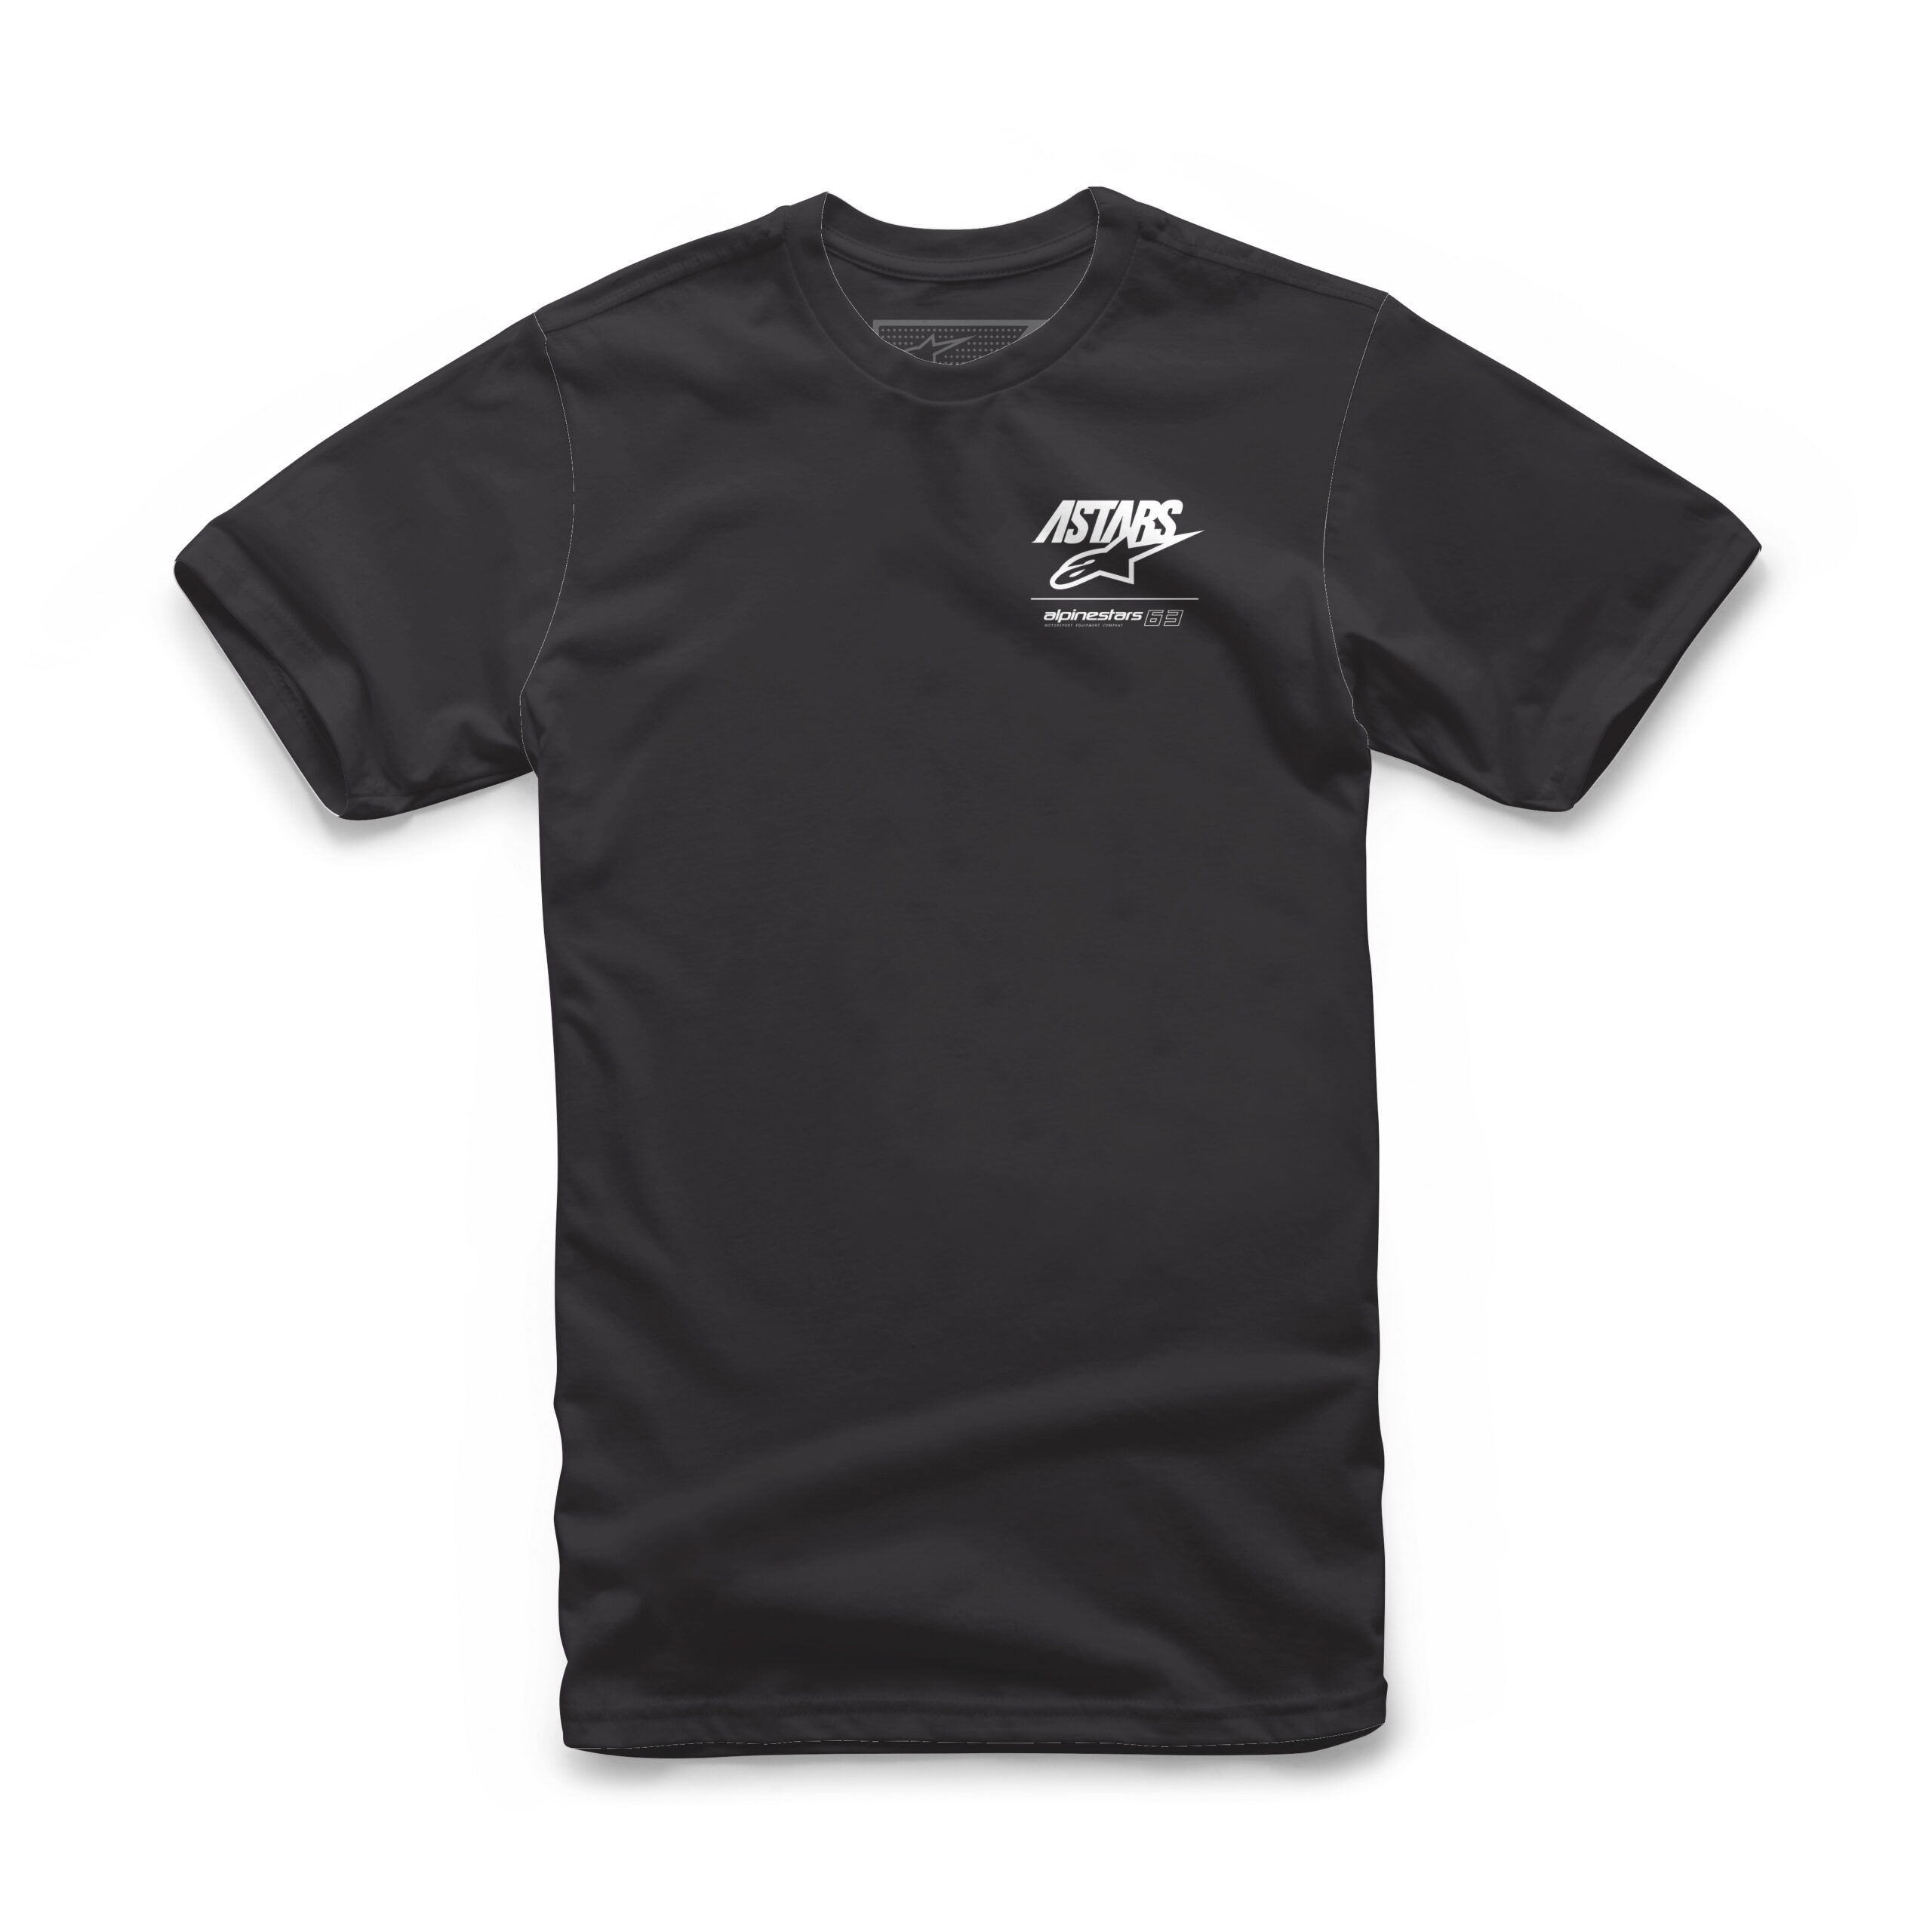 Alpinestars Astars 63 Tee - zwarte T-shirt voor mannen